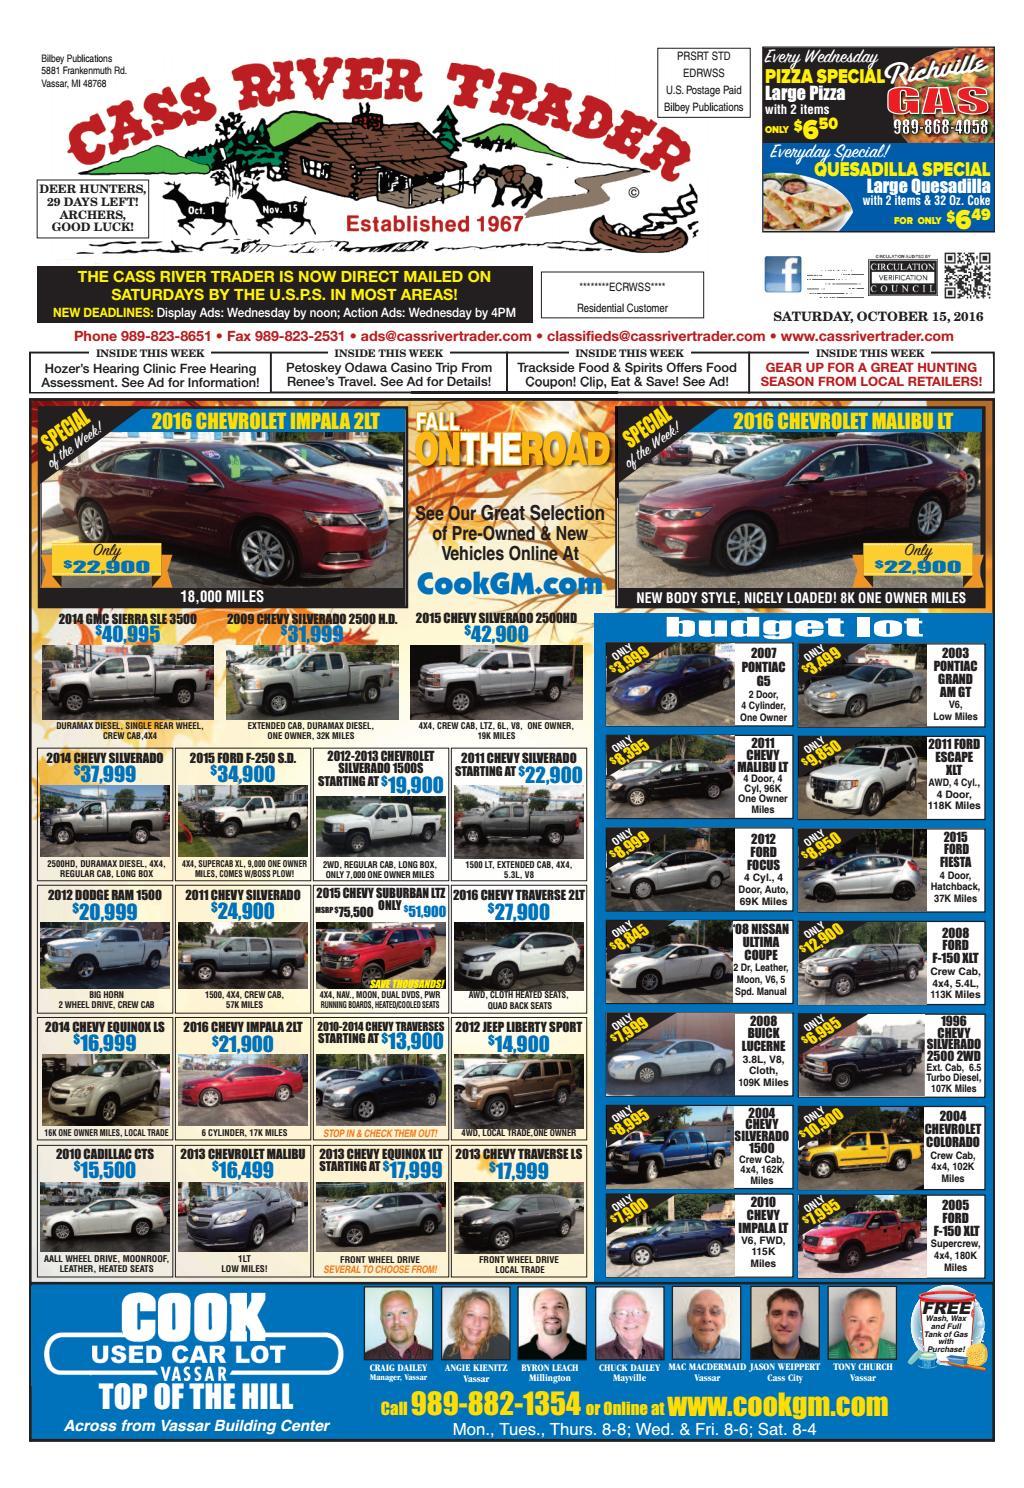 Rear Side Door Quarter Cover L+R 2P OEM Parts For GM Chevrolet Cruze 2008-2012